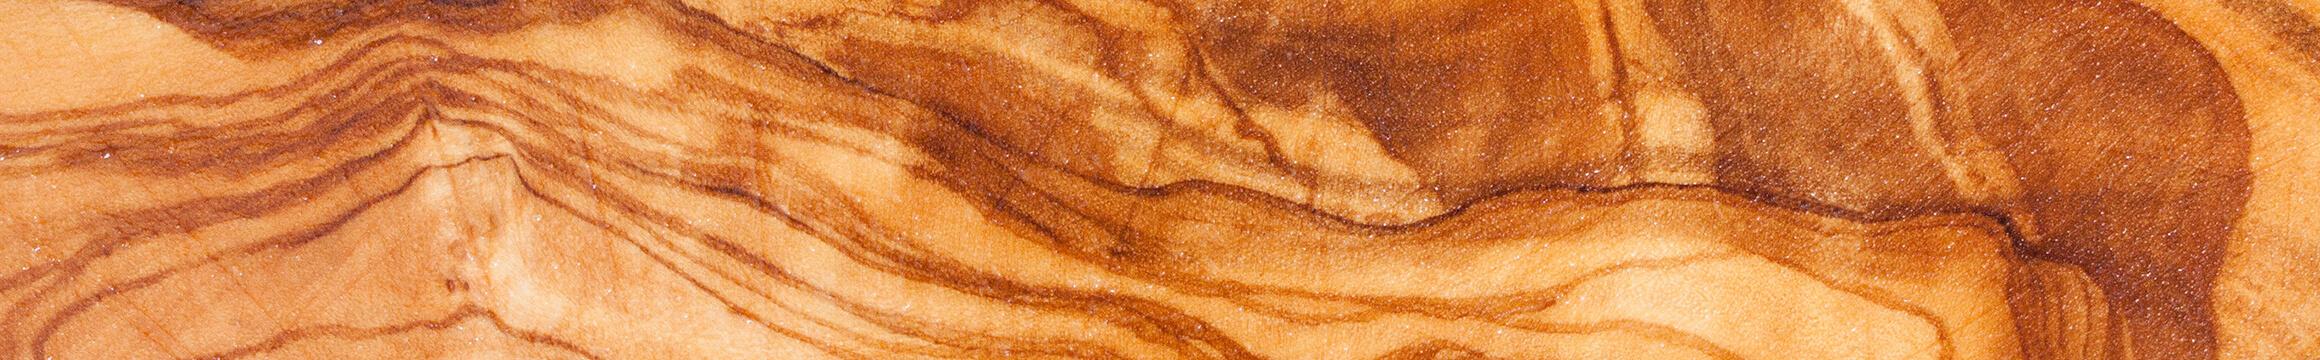 Woodgrain 02